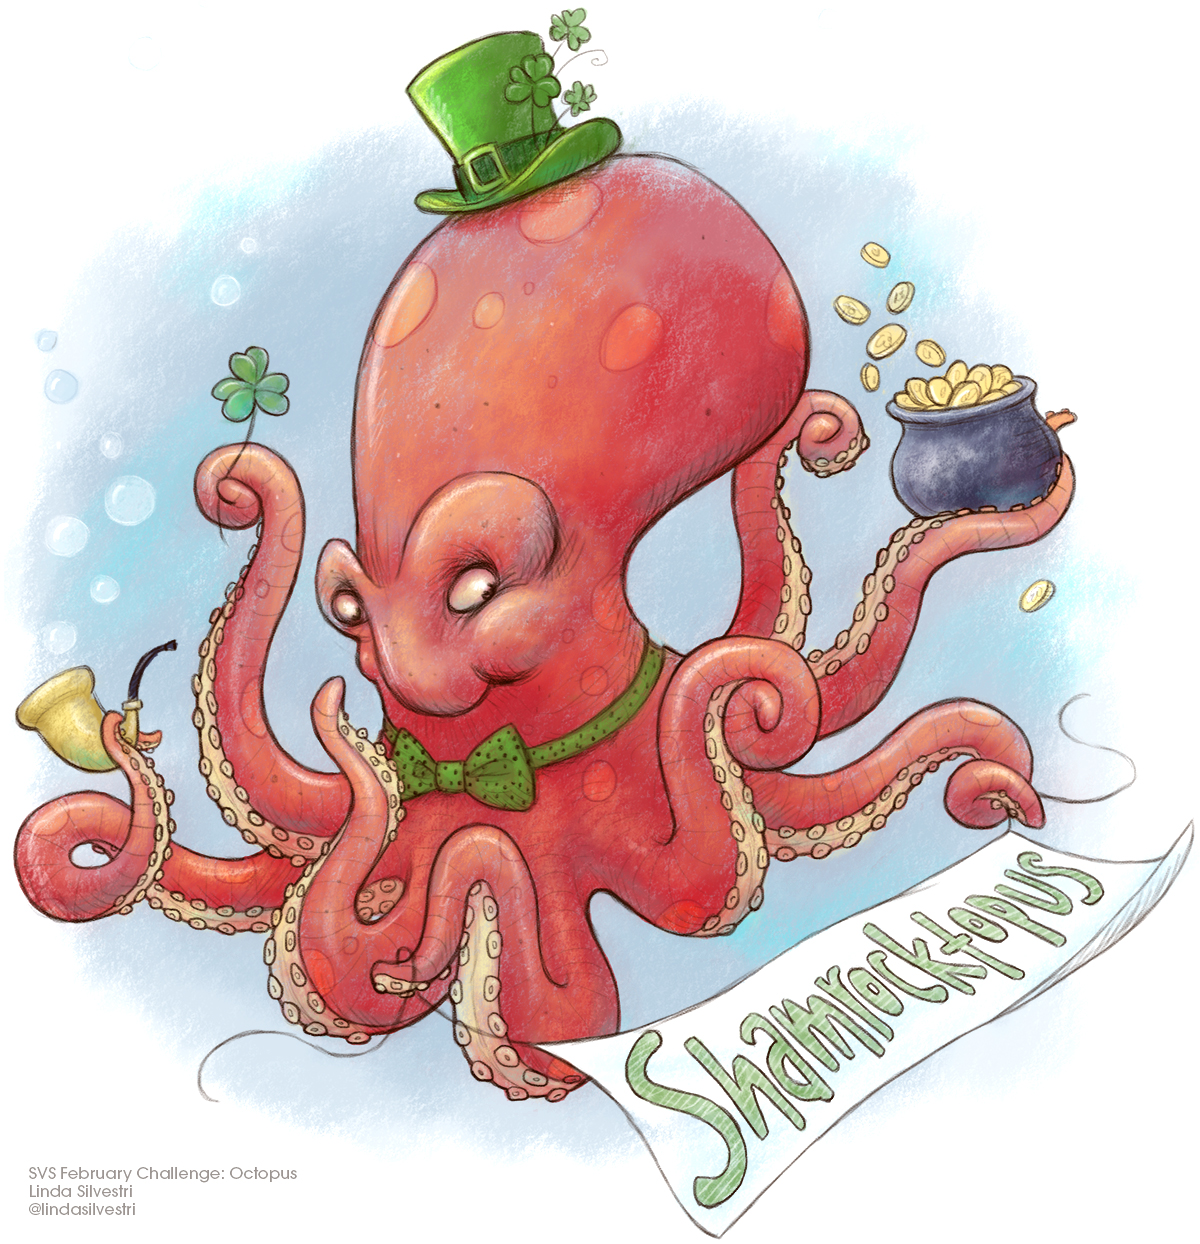 SVS_Feb_Octopus_LindaSilvestri